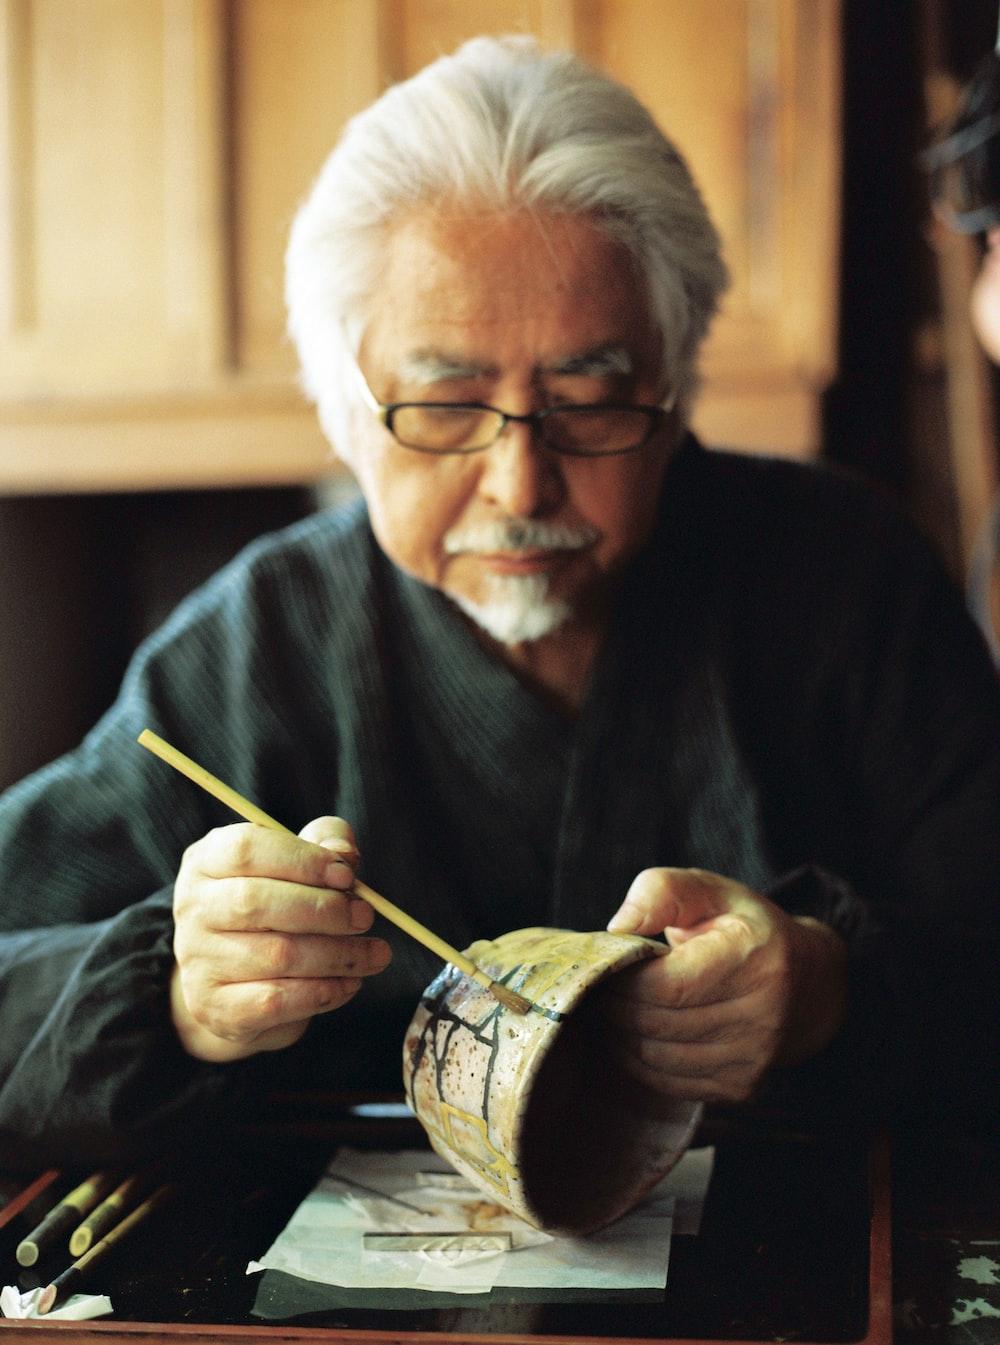 man in black sweater holding brown chopsticks